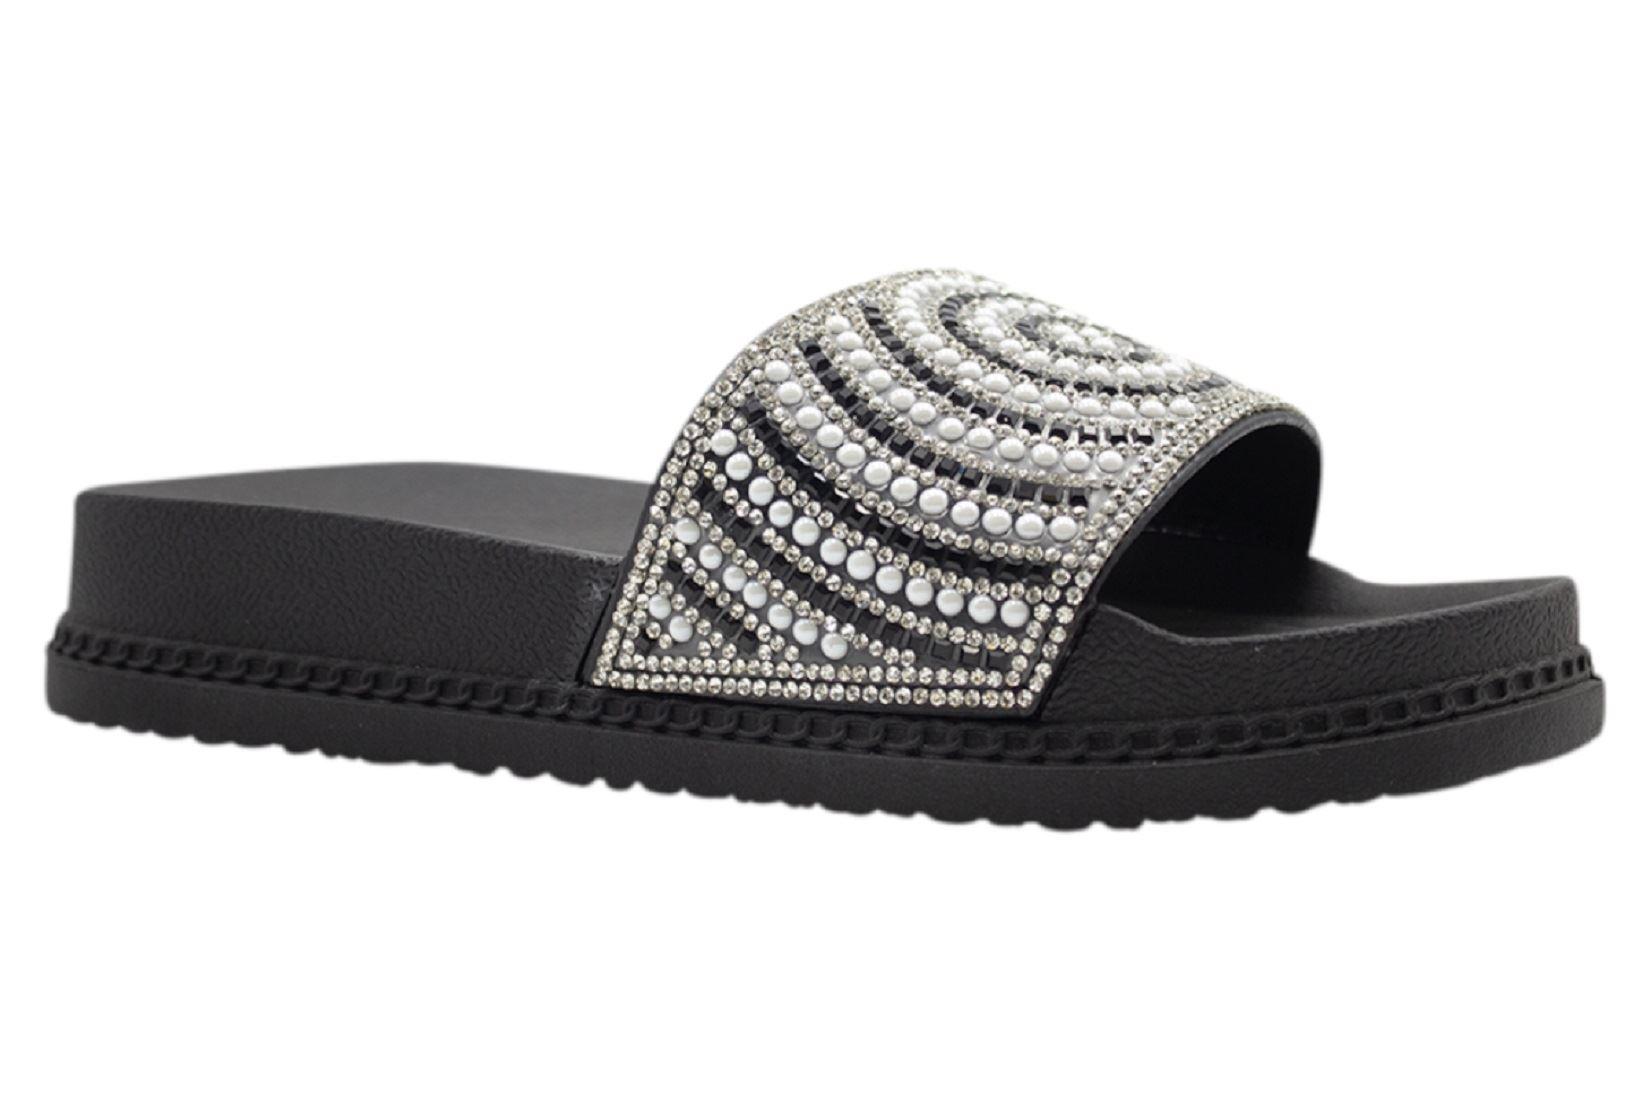 Womens-Sliders-Casual-Slippers-Mules-Ladies-Diamante-Flip-Flop-Sandals-Shoes thumbnail 47